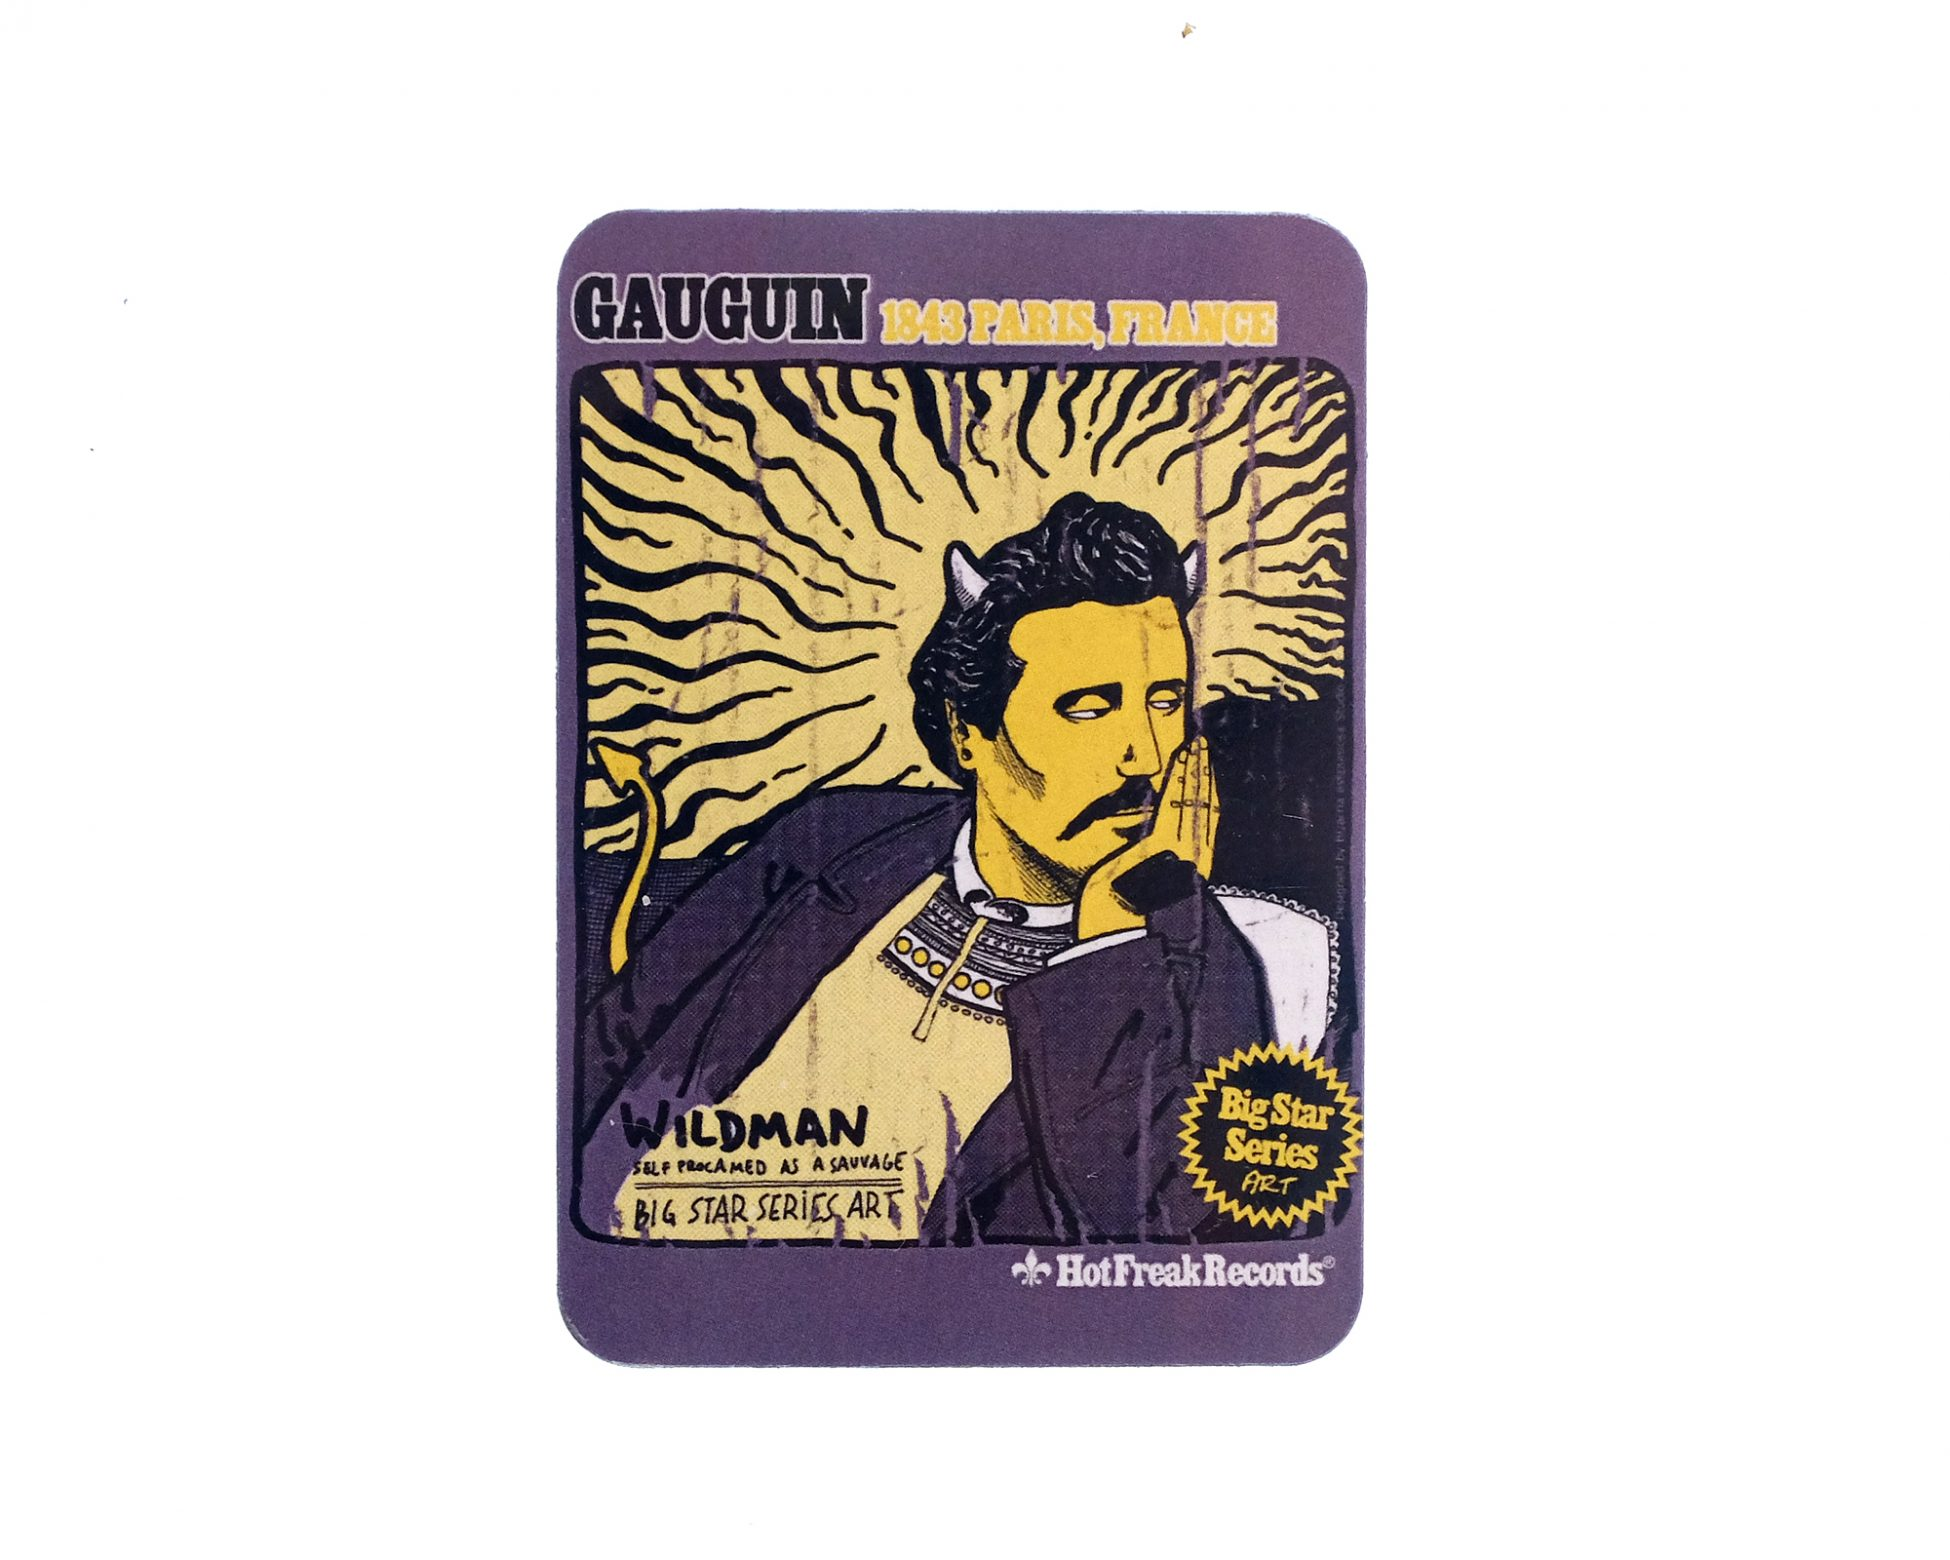 Dibujo del artista Paul Gauguin. Merchandising iman.